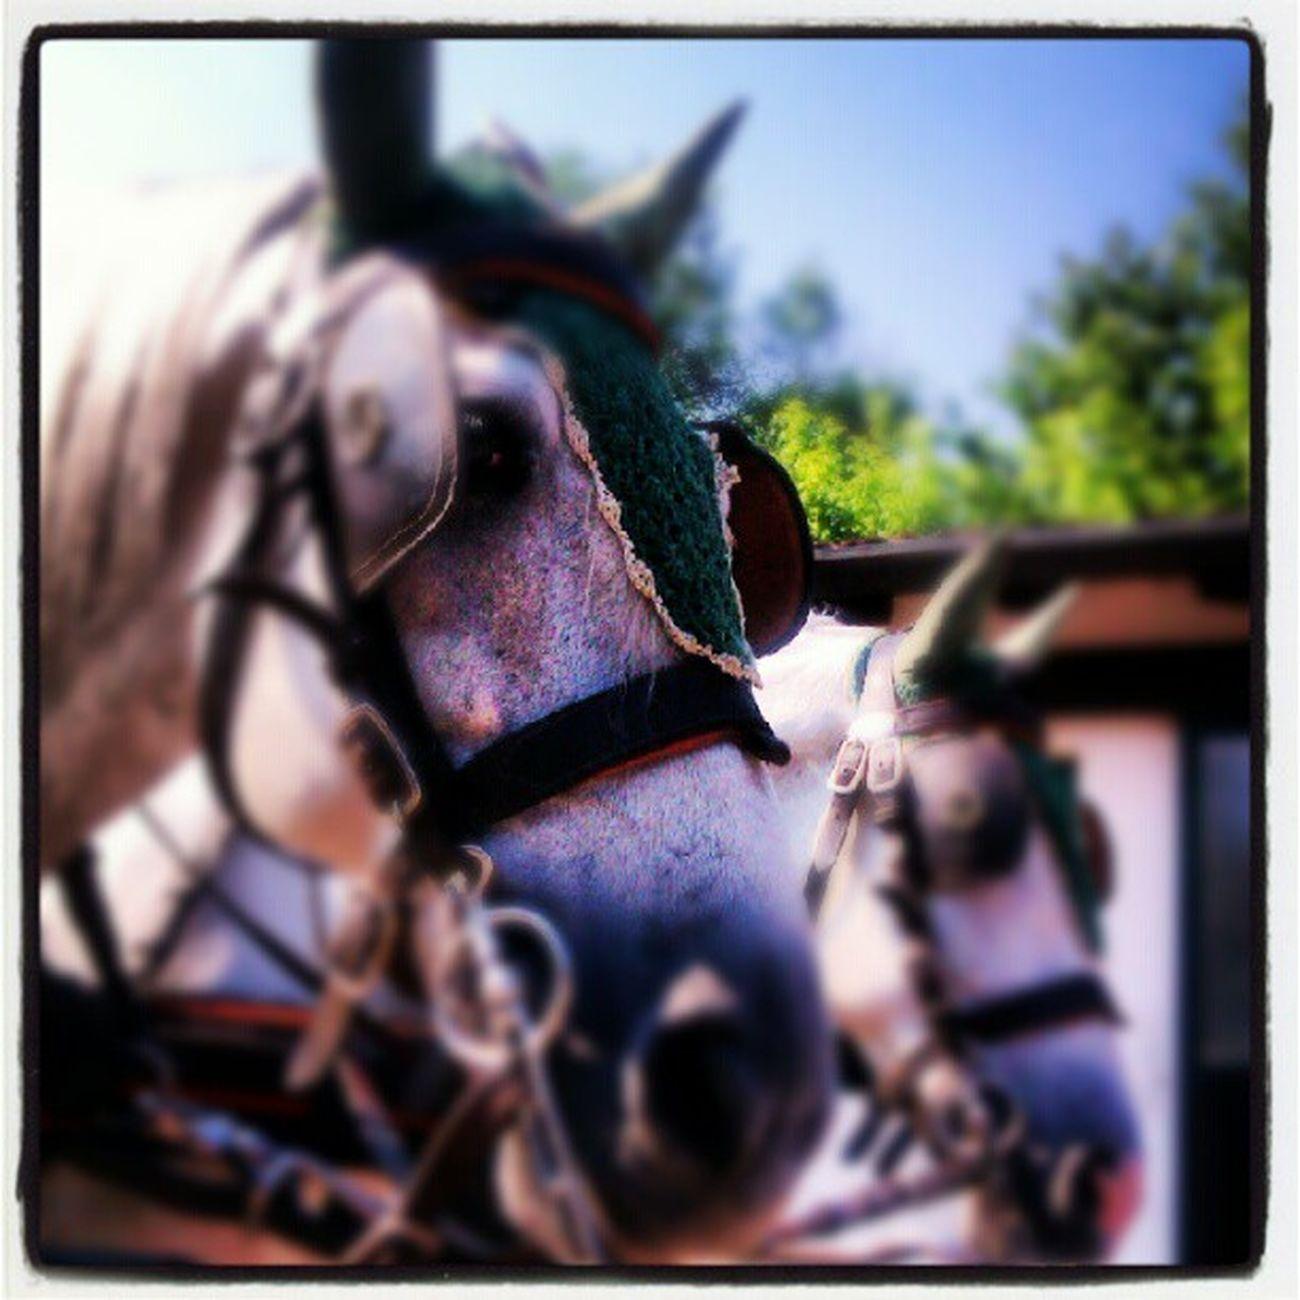 Io e Zoli Welovedrivingsport Combineddriving Fahrsport Sportkörning Drivingsport Pony Yourdailyhorses Equestrian Carriagedriving Attelage